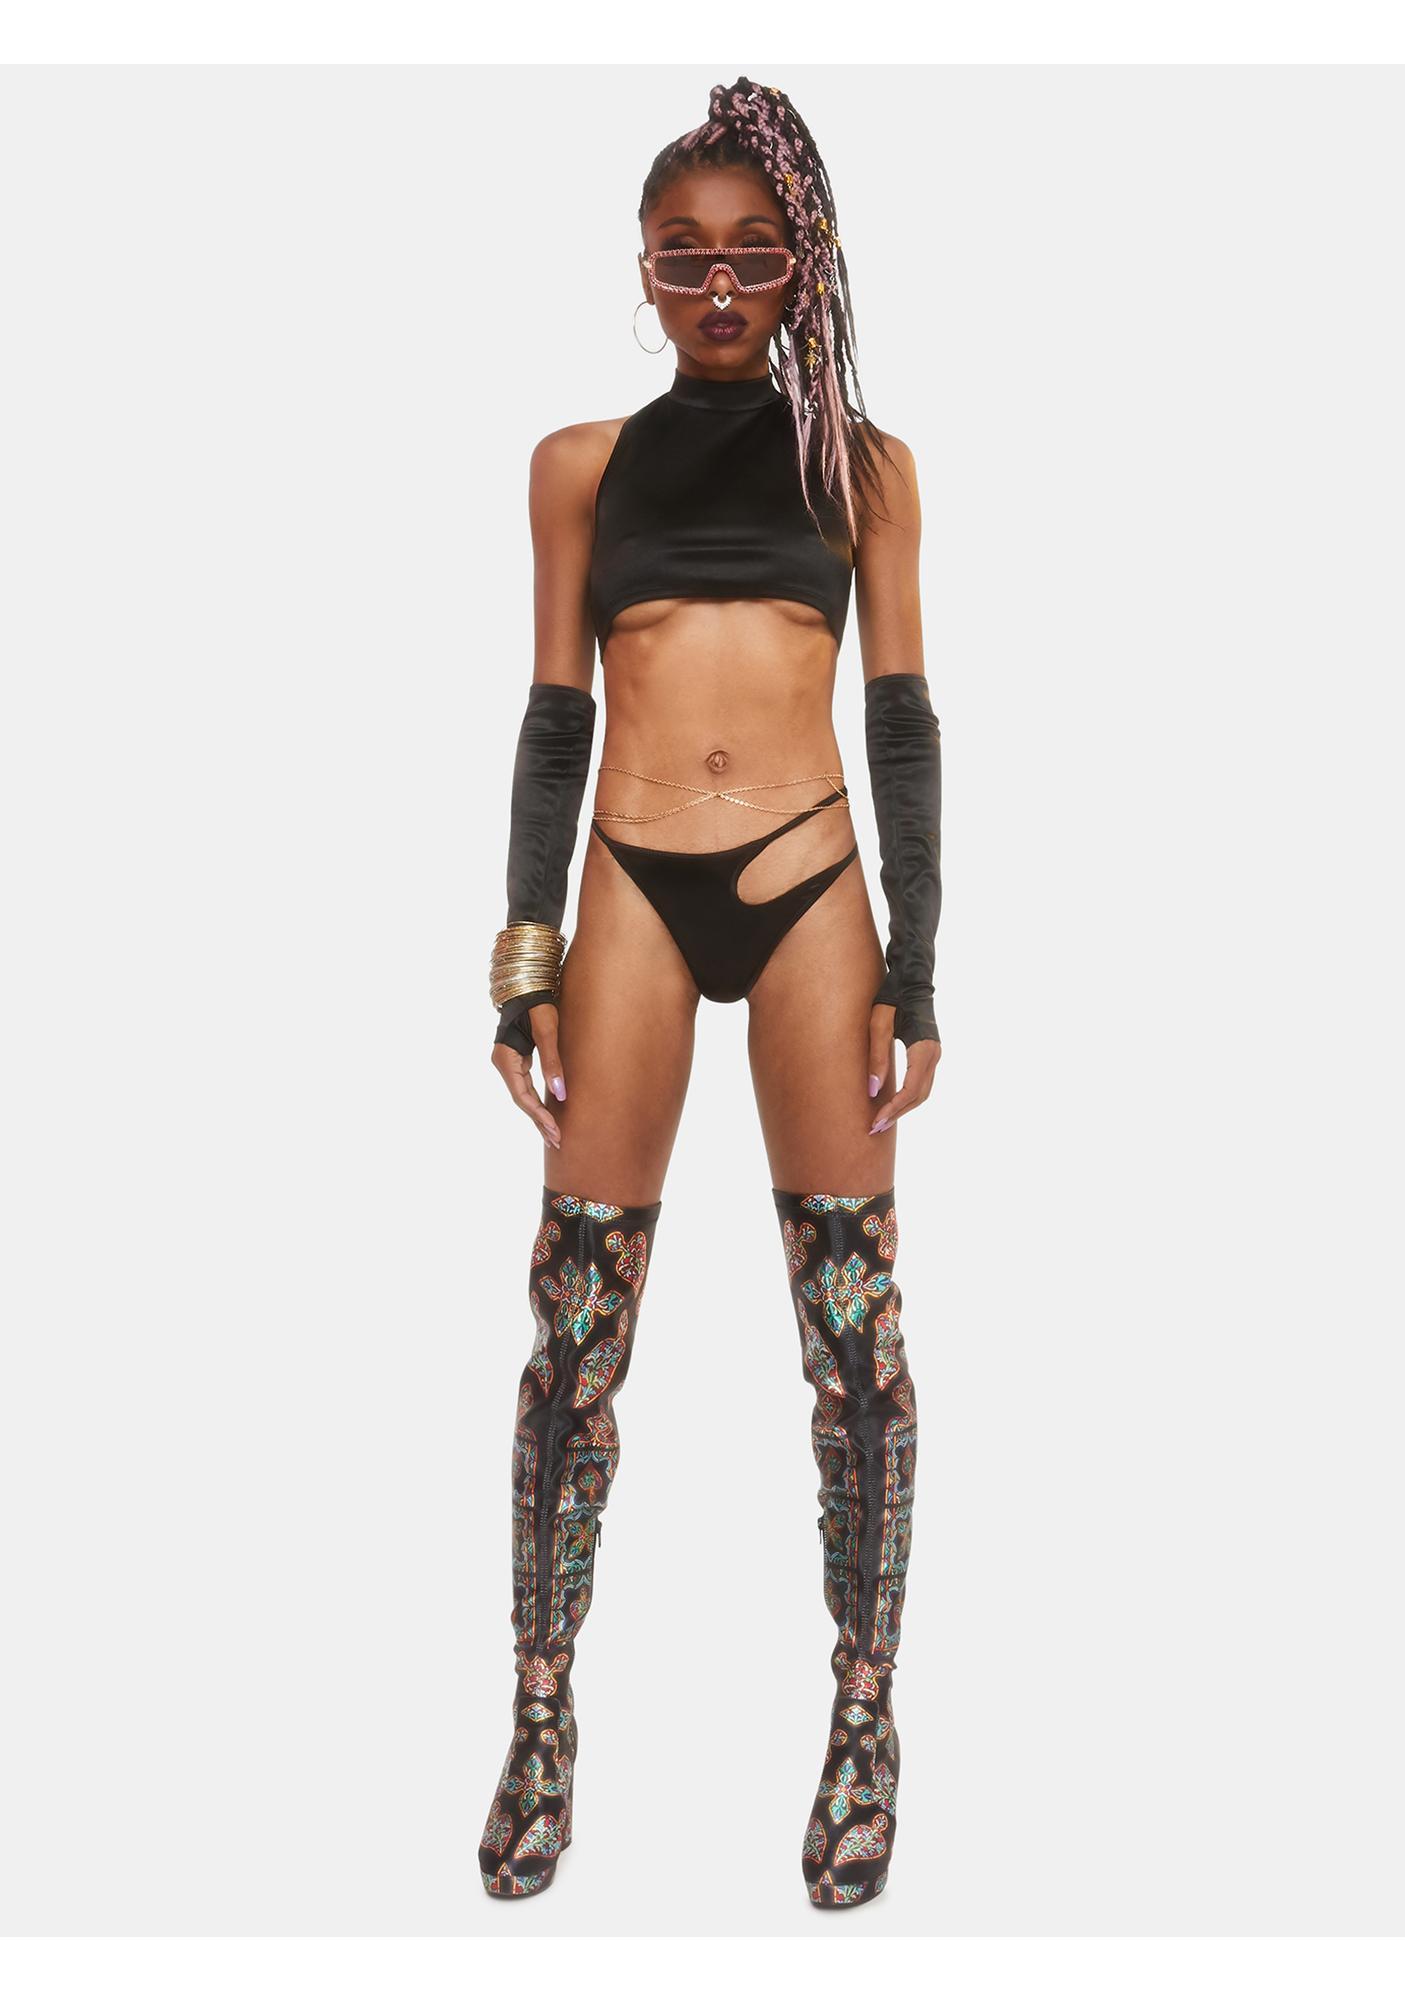 Club Exx Supernova Girl Asymmetrical Undies